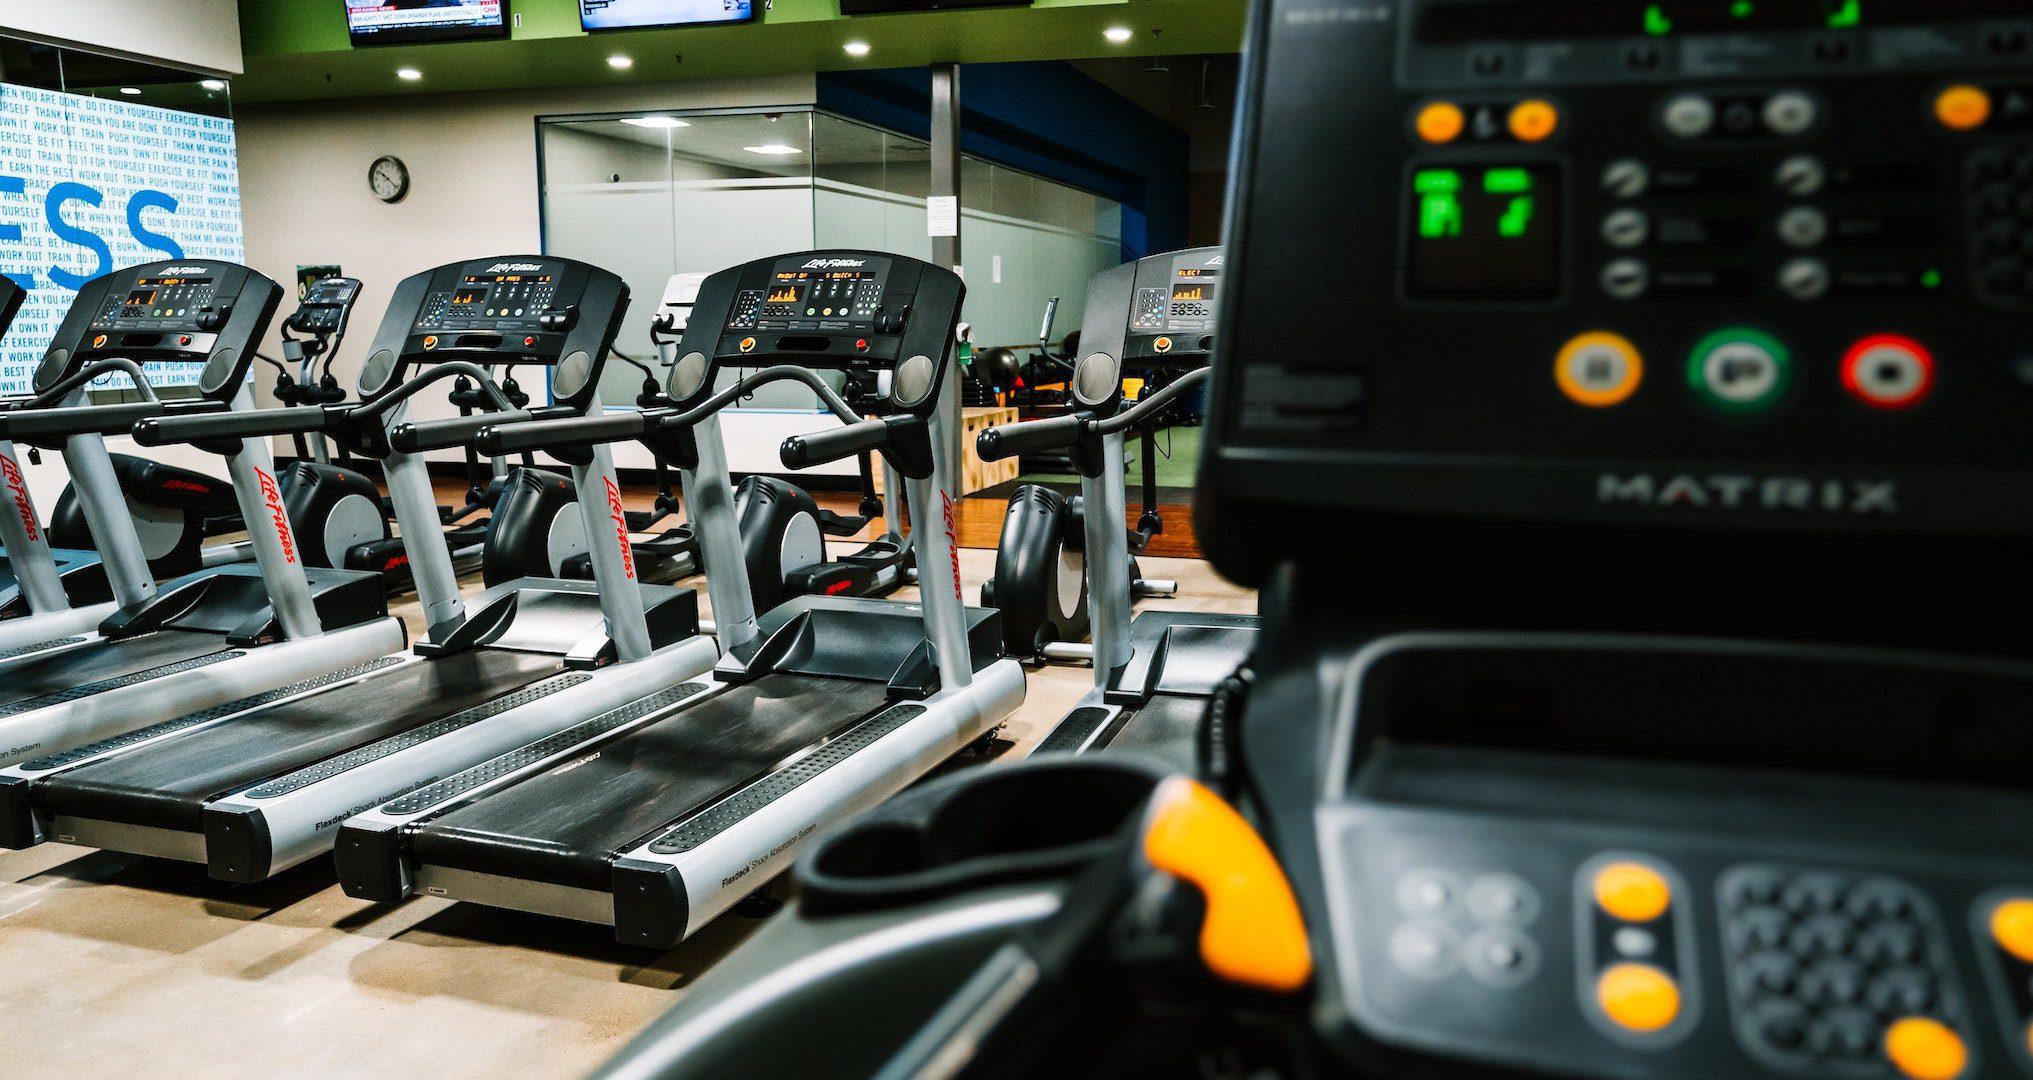 multiple treadmills in a gym